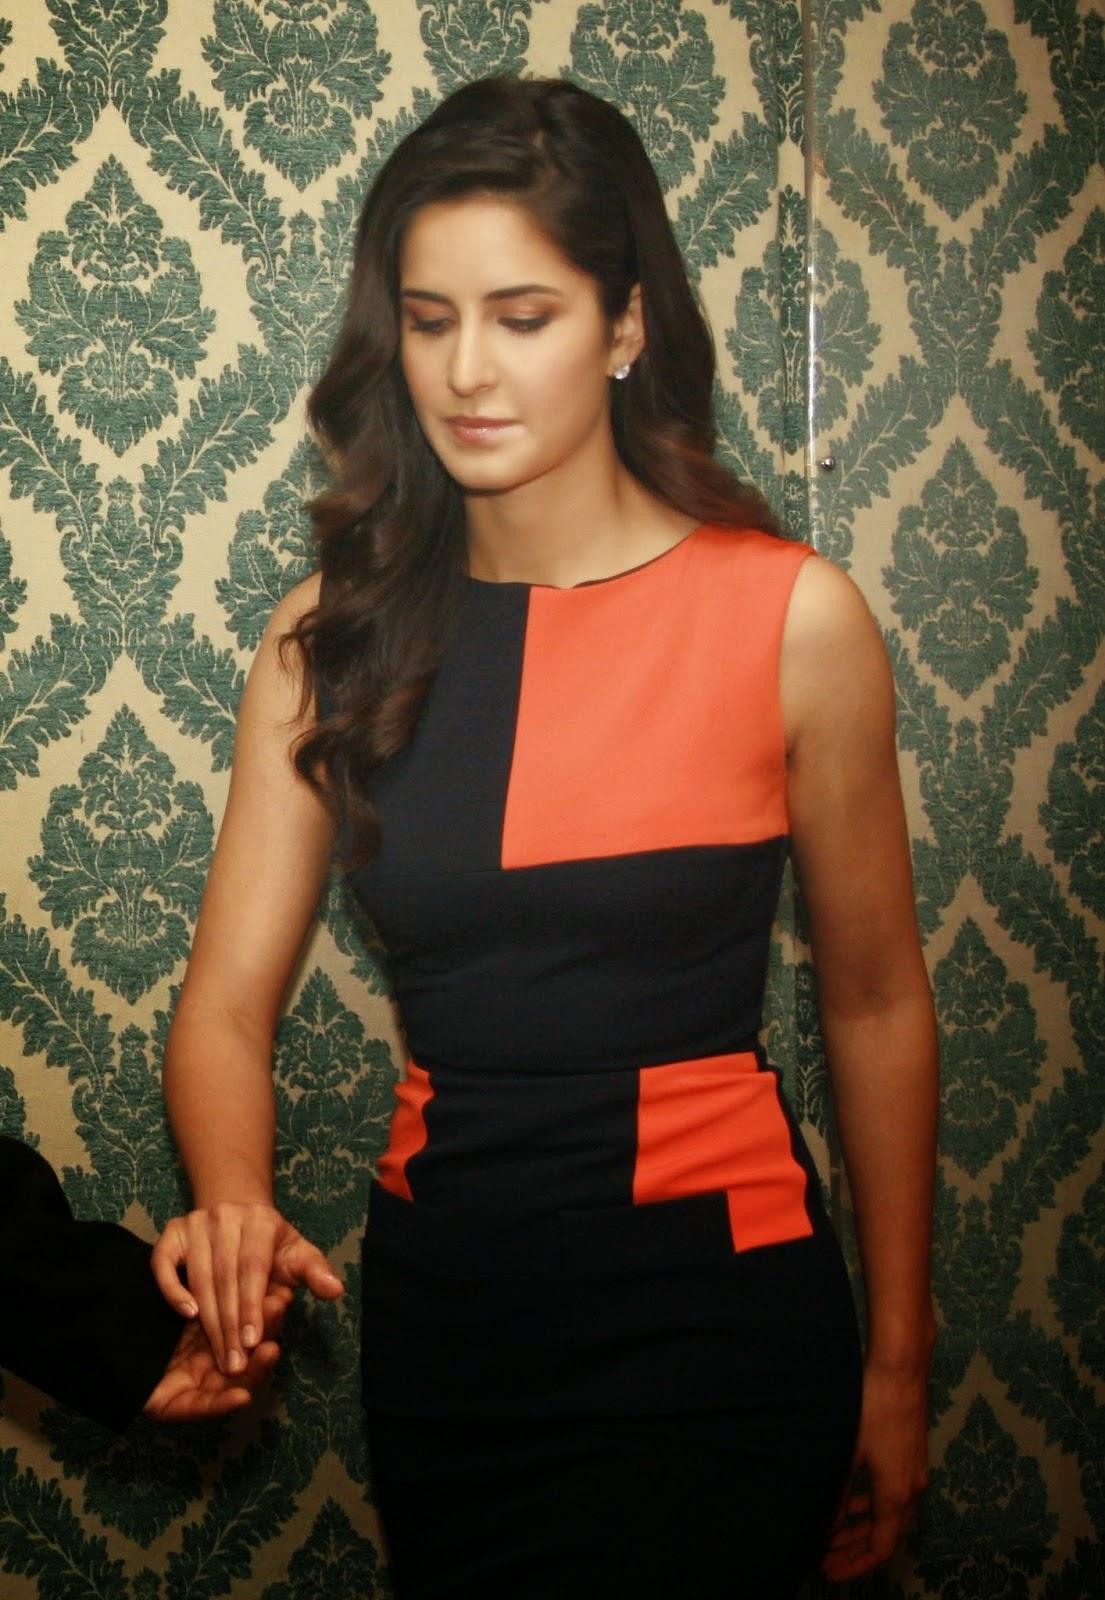 Katrina Kaif Latest Hot Photos Gallery In Orange Dress